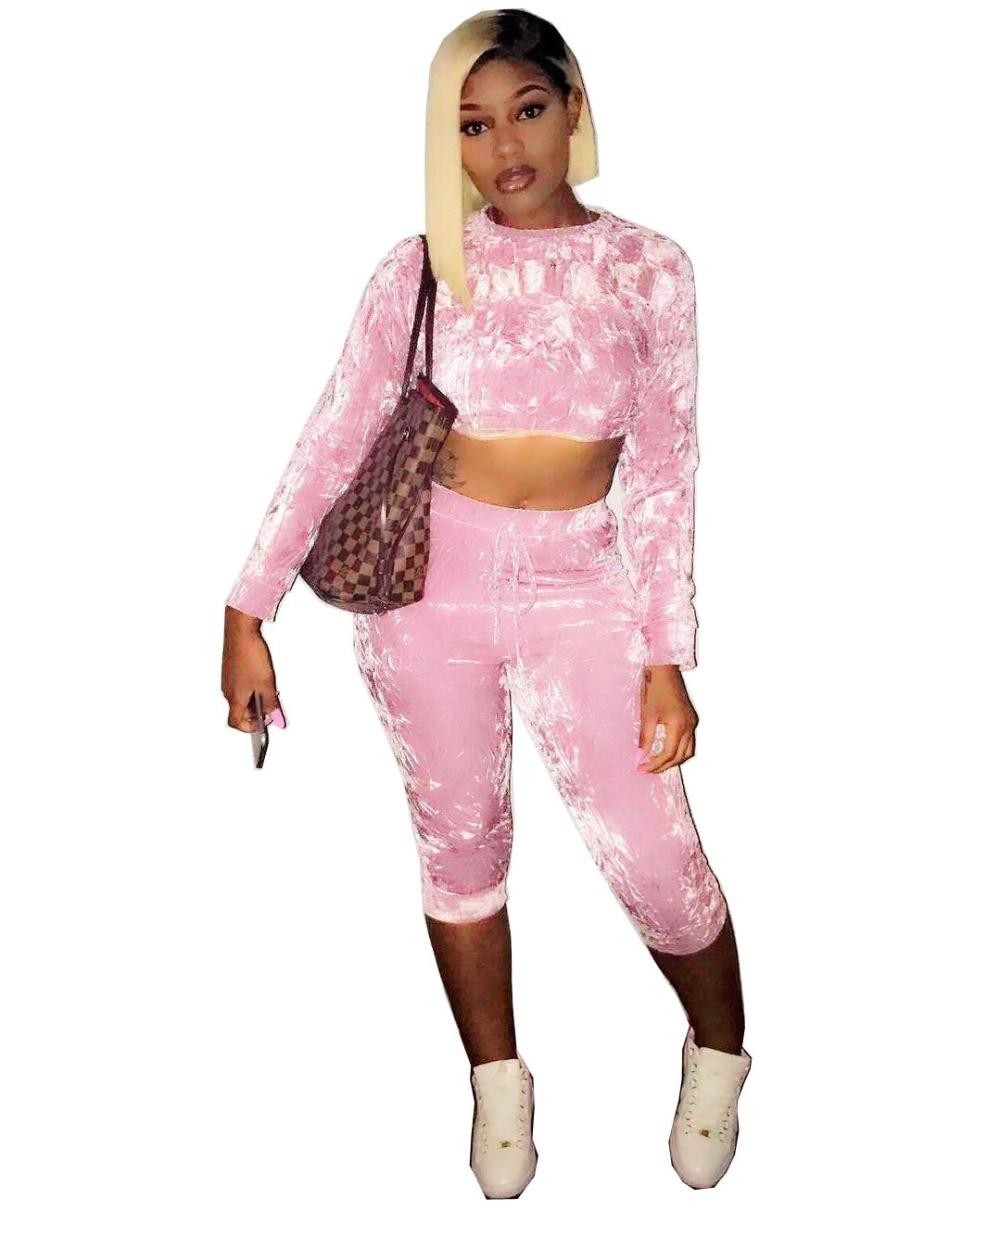 Women's Clothing Industrious Women Sexy Bodycon Jumpsuit Two Pieces Long Sleeve Velvet Bandage Bodysuit Women Ovearlls H6022 Yet Not Vulgar